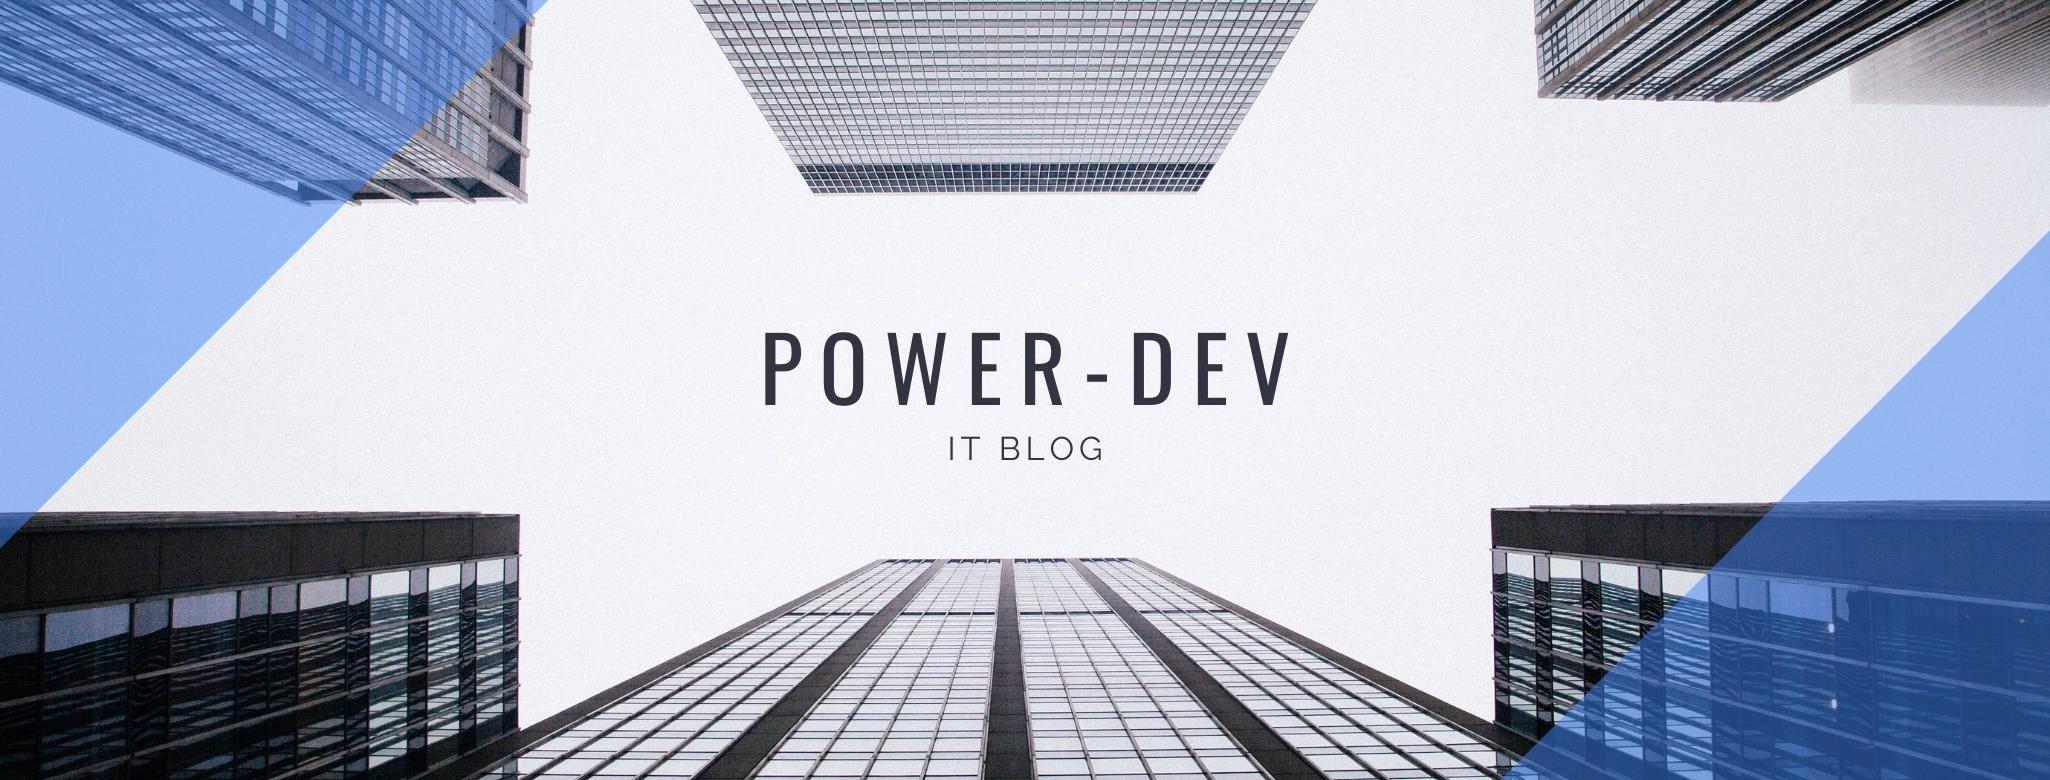 Power-Dev